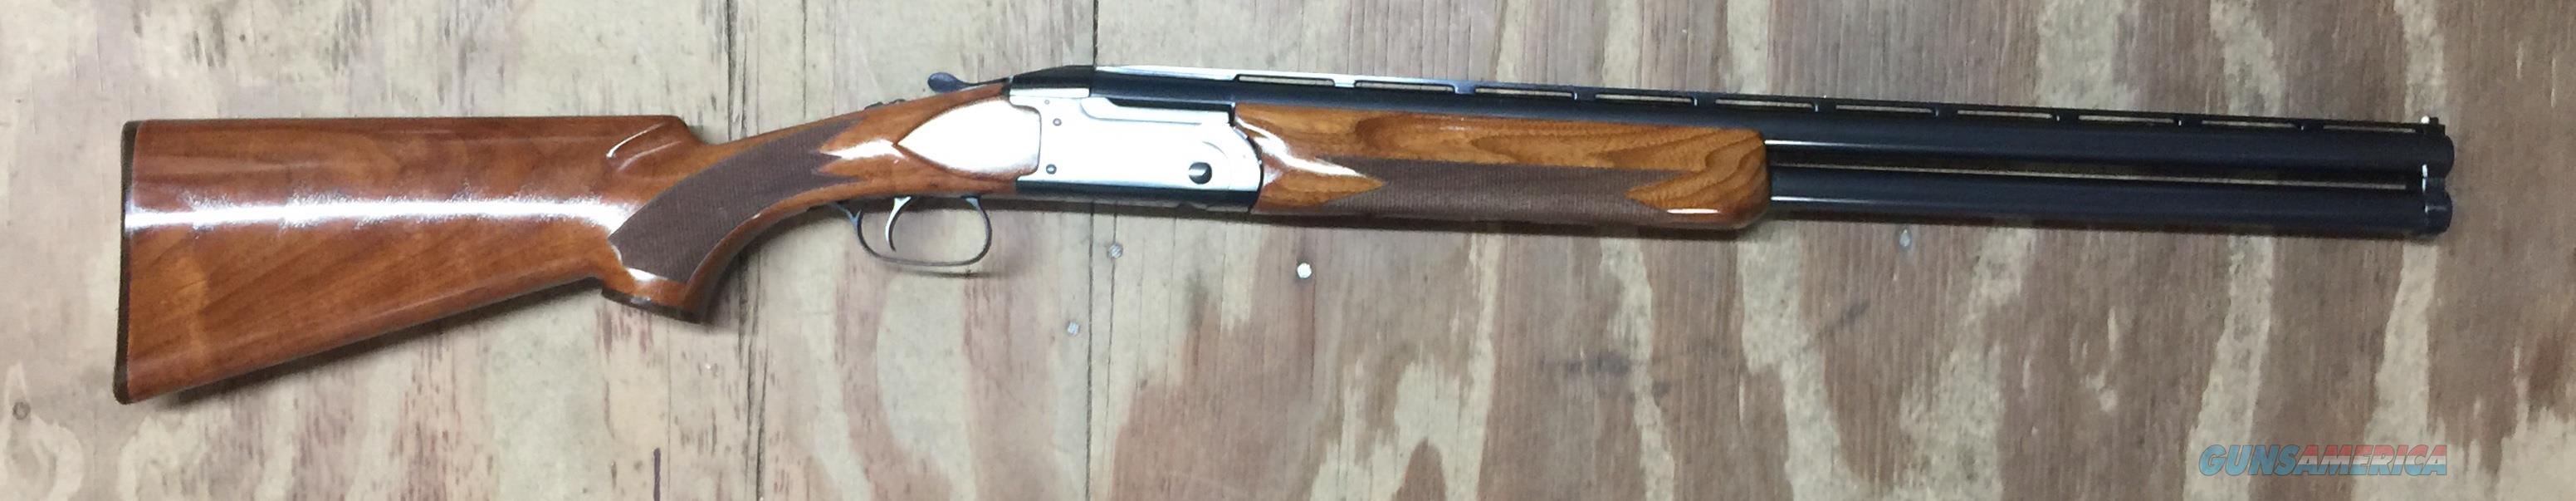 Remington Model 3200 Trap 12 Guage   Guns > Shotguns > Remington Shotguns  > Over Under